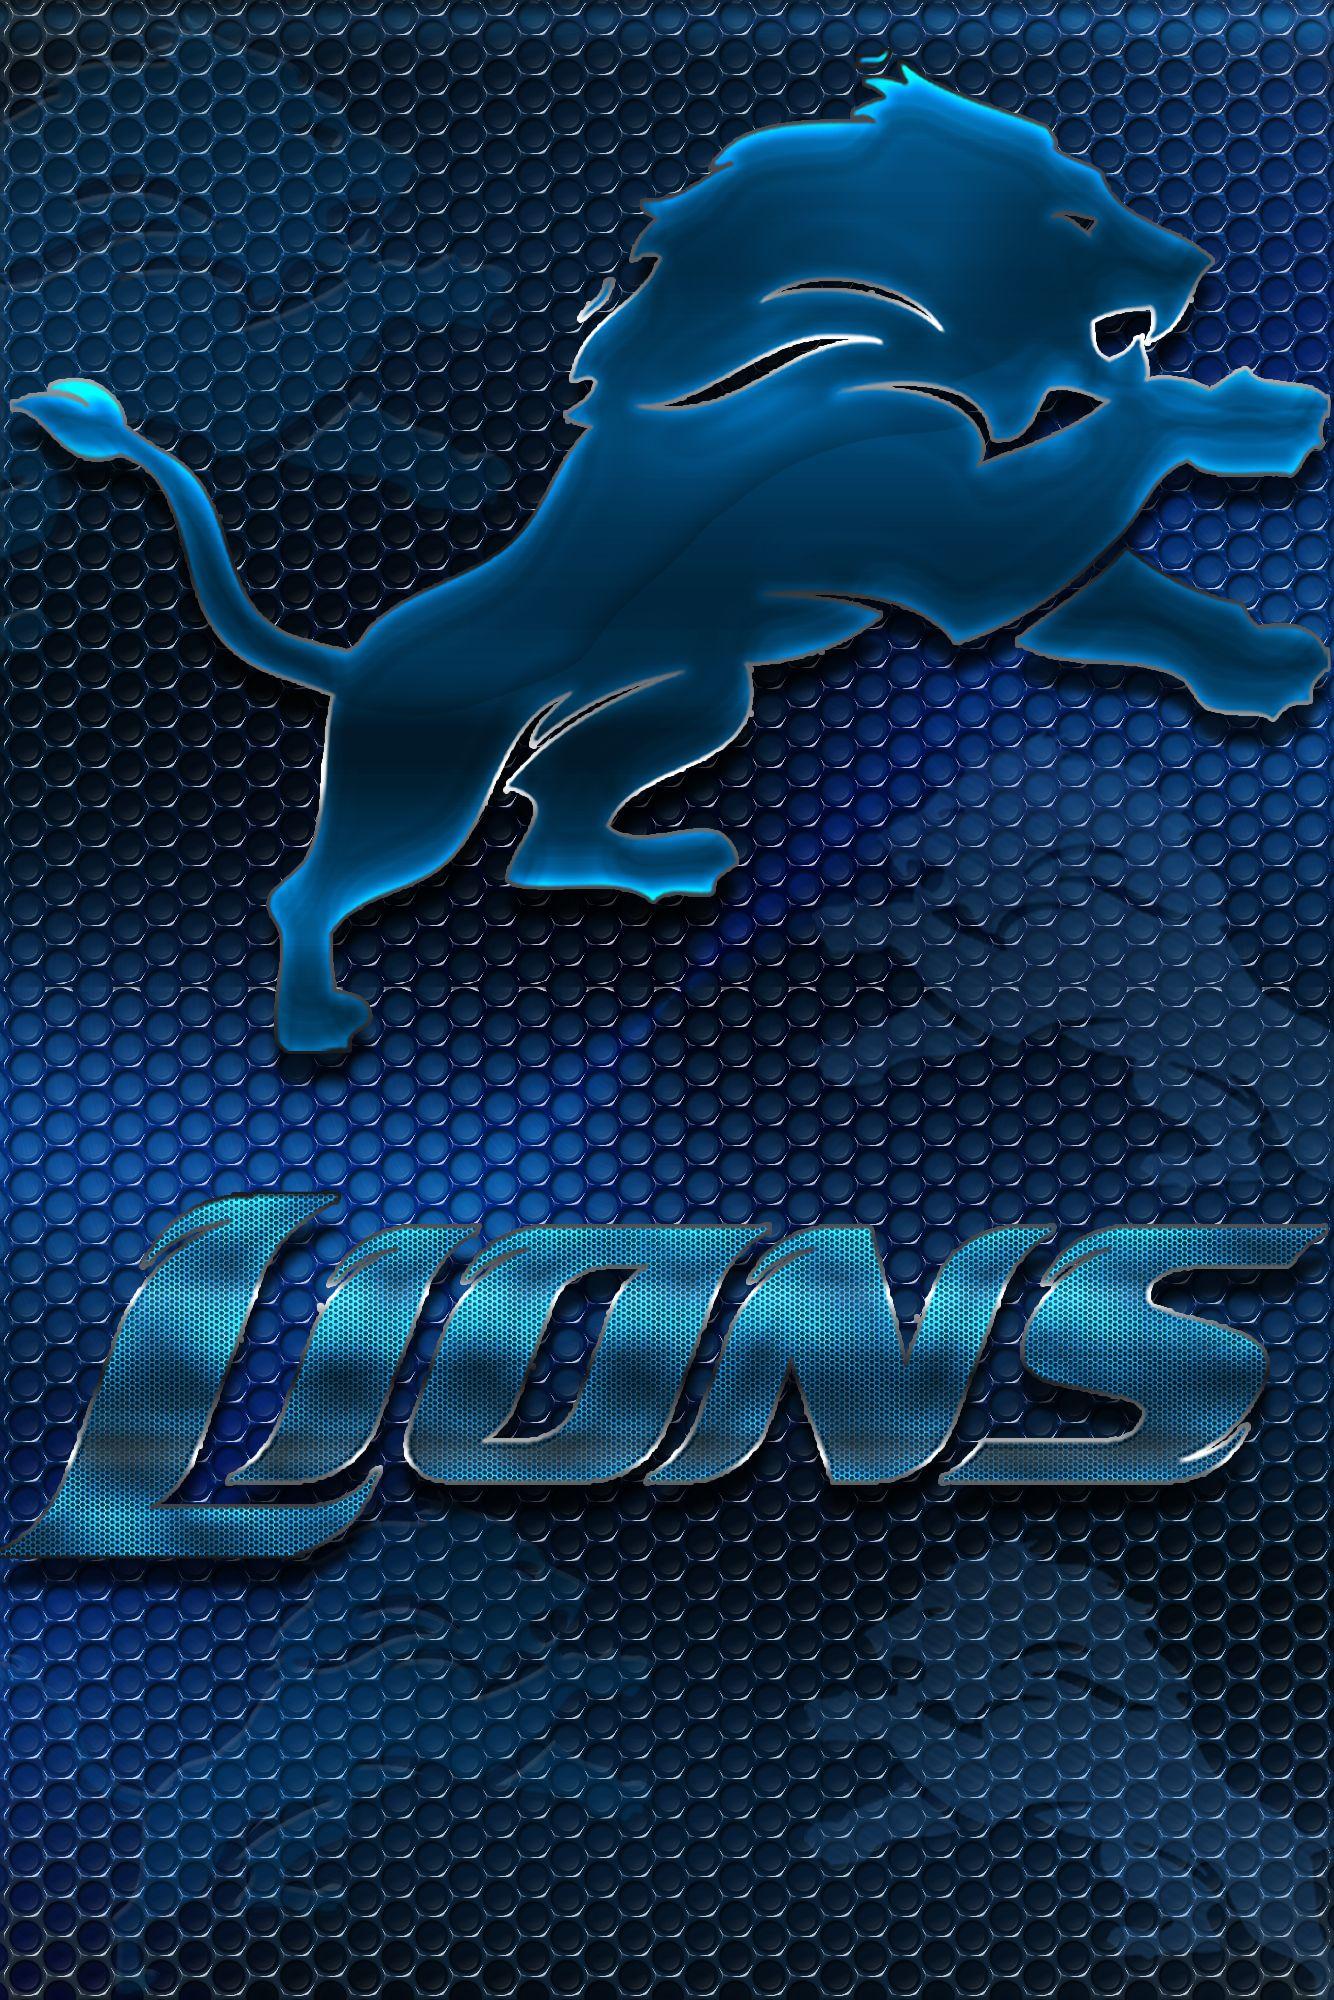 Nfl detroit lions 8 iphone 6 wallpaper best games - Nfl wallpaper iphone ...